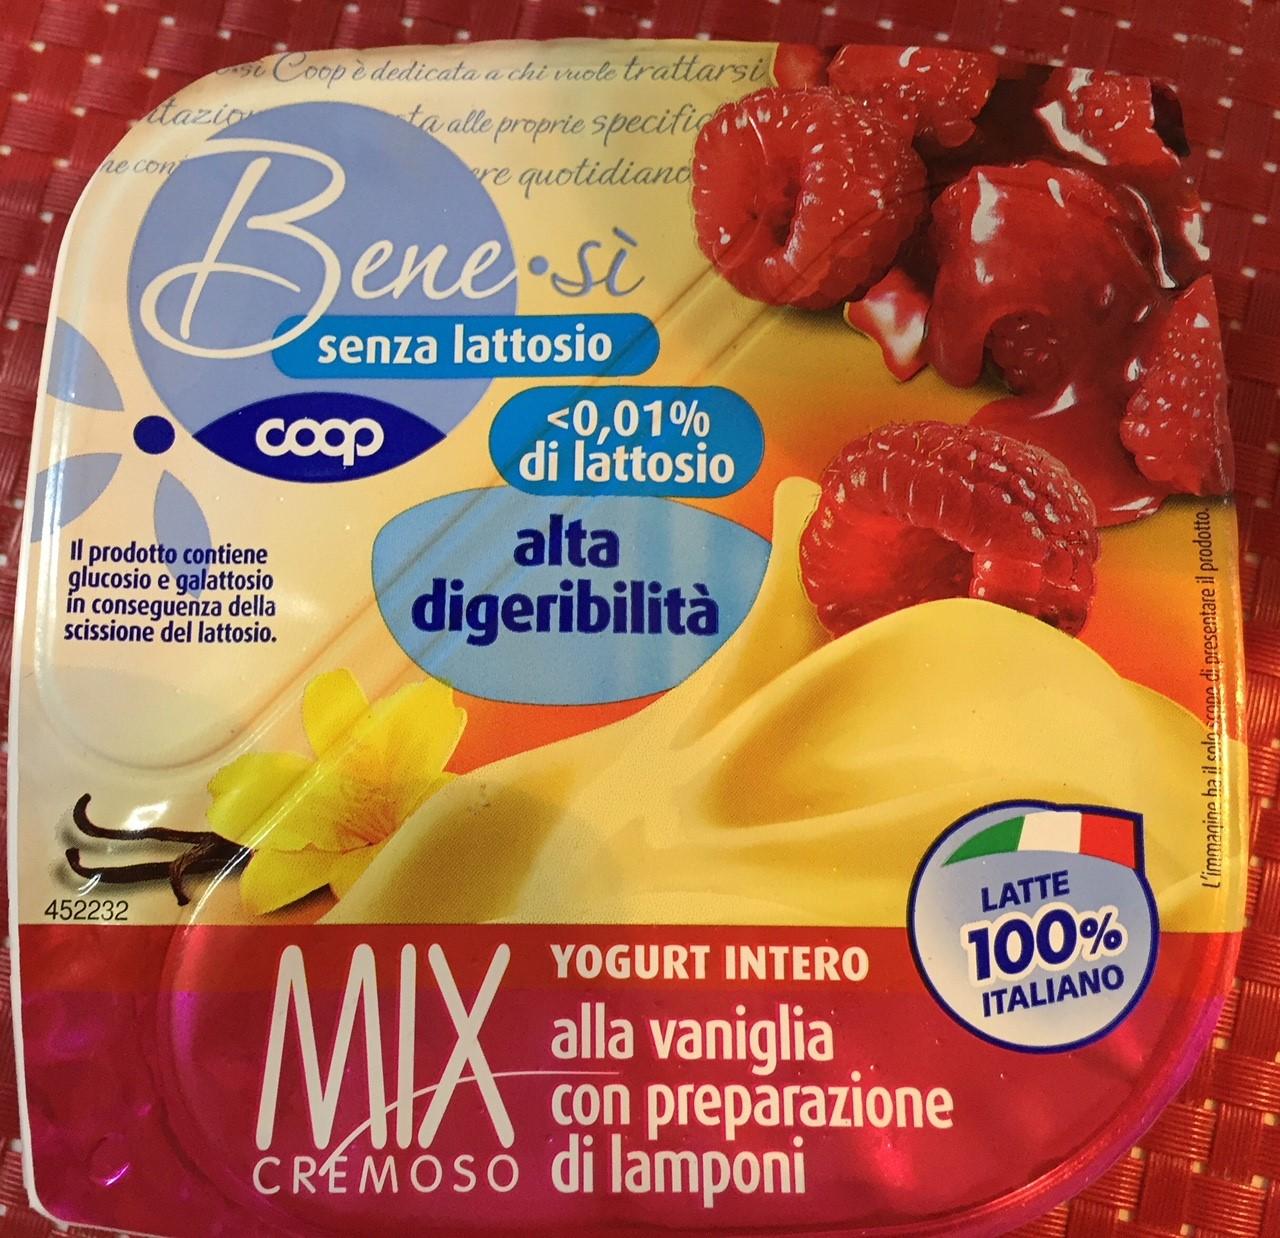 Yogurt vaniglia e lampone Bensì Coop - lattosio <0,01 Image